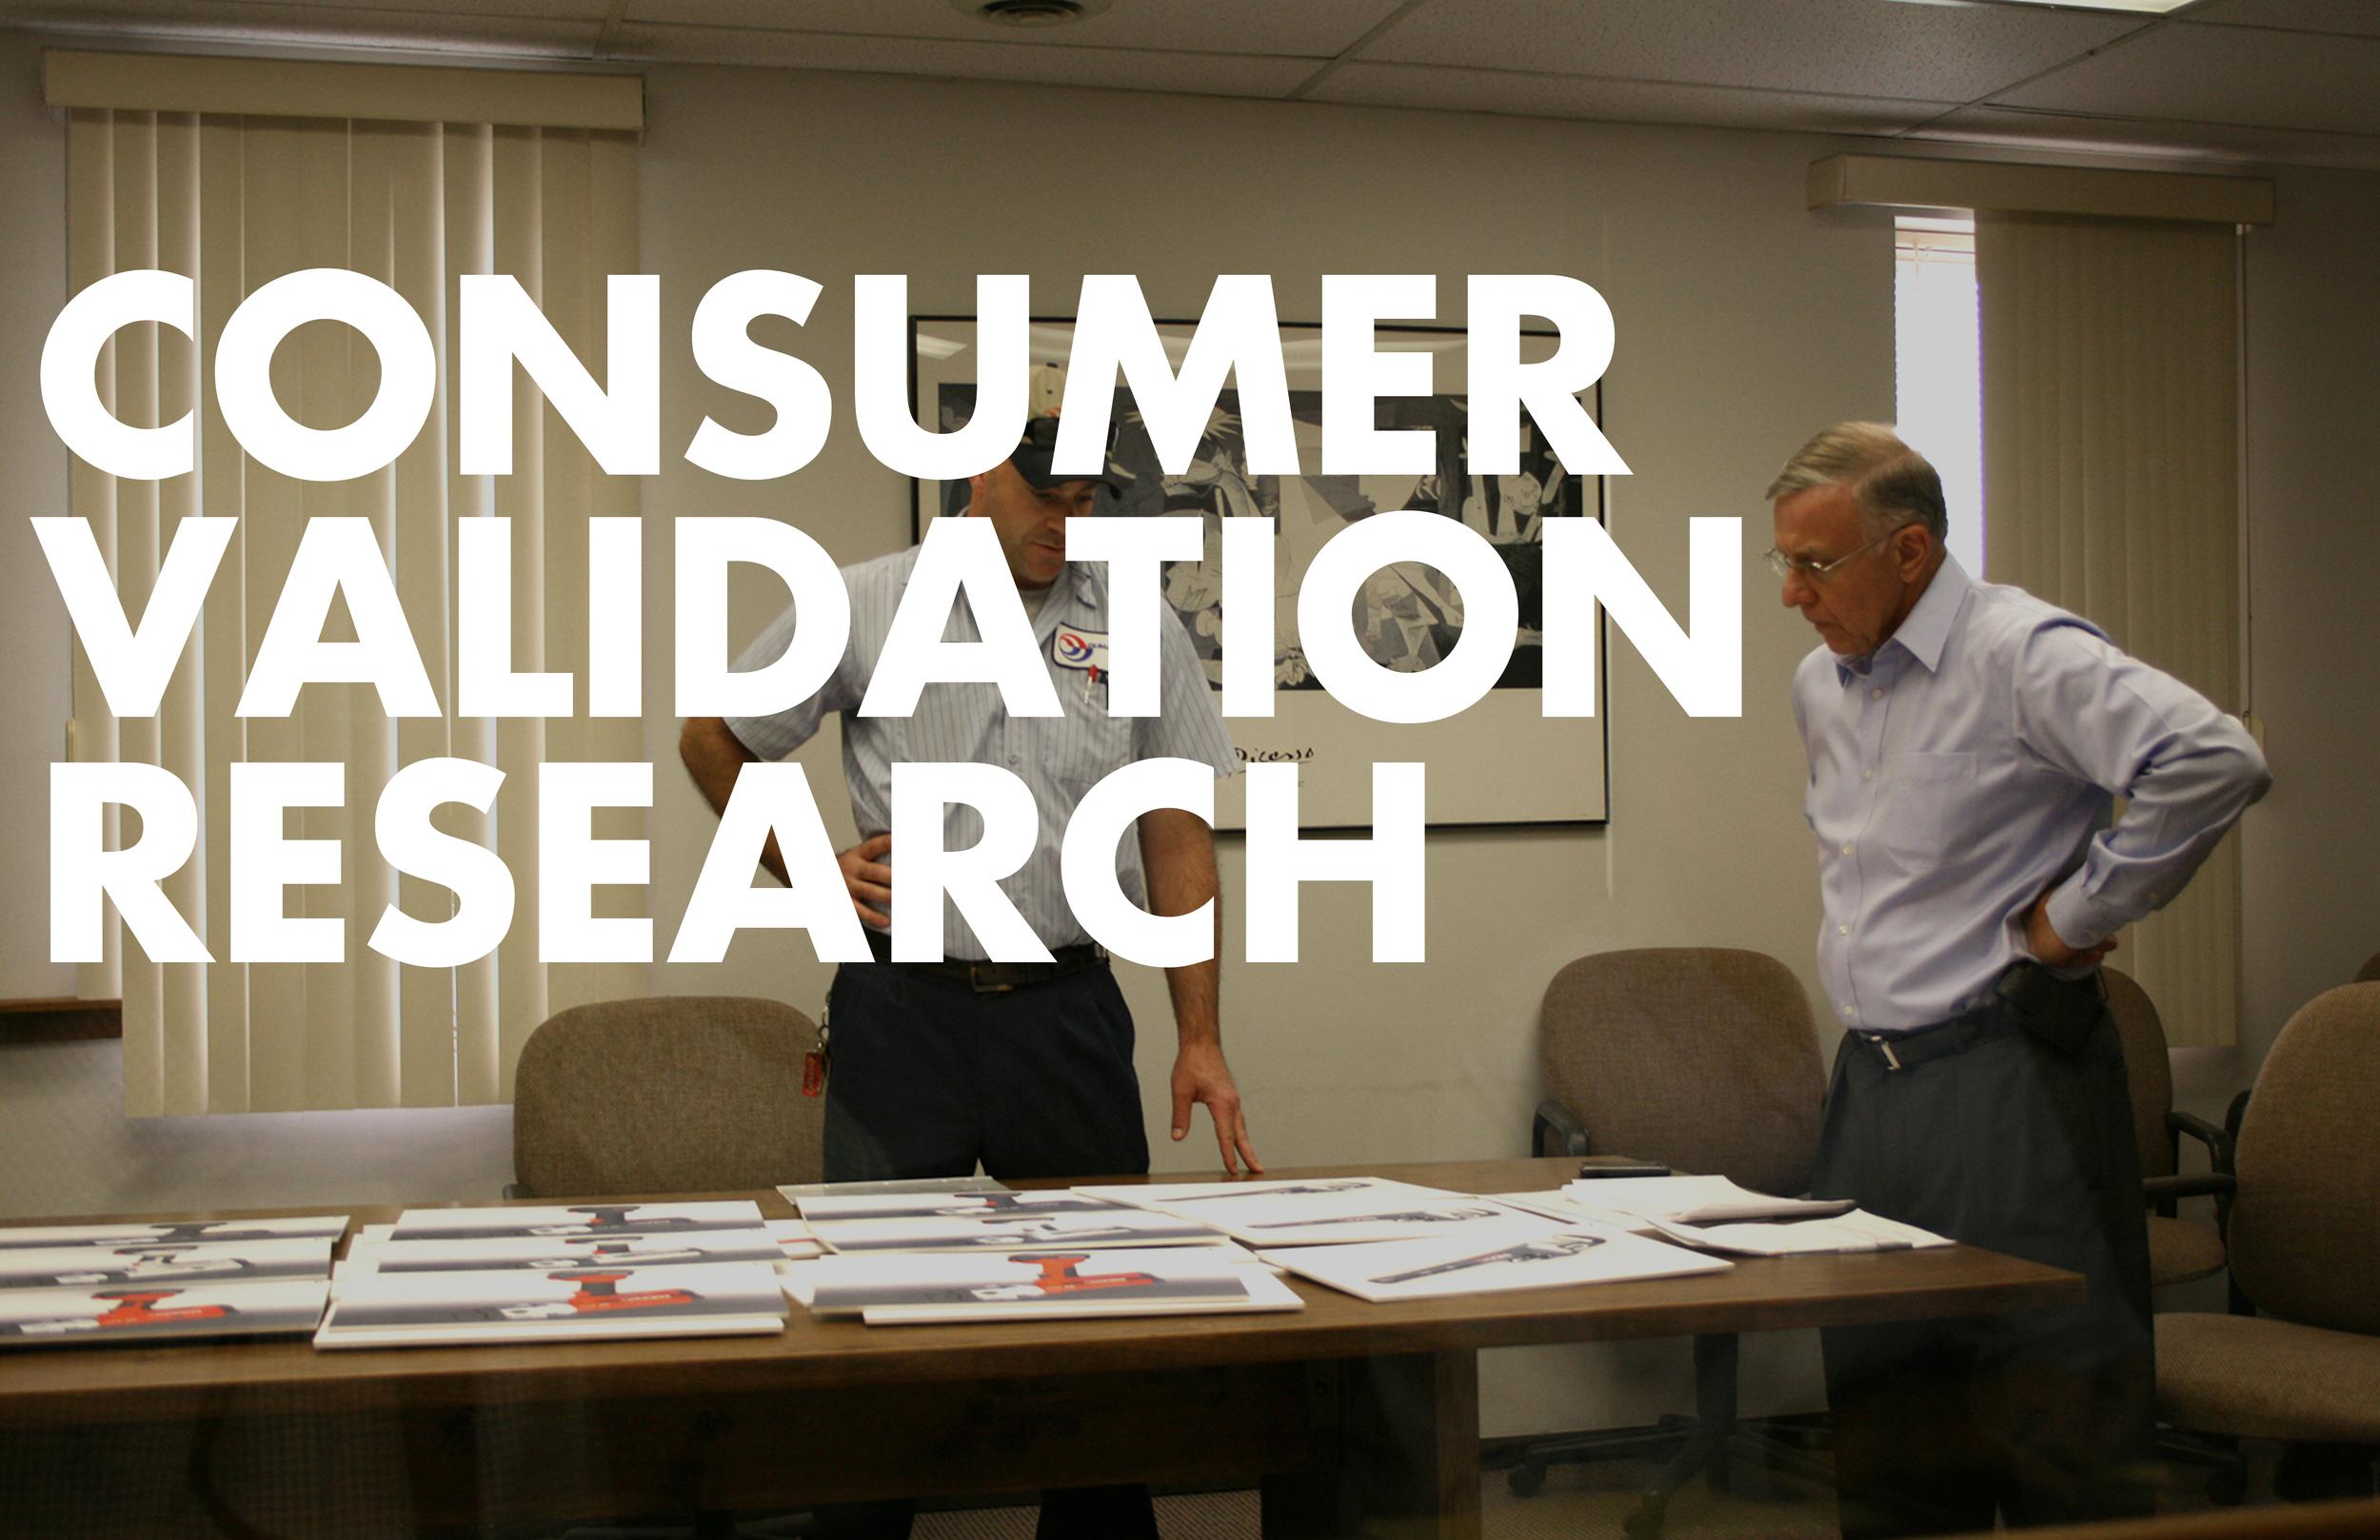 ConsumerValidationResearch.jpg